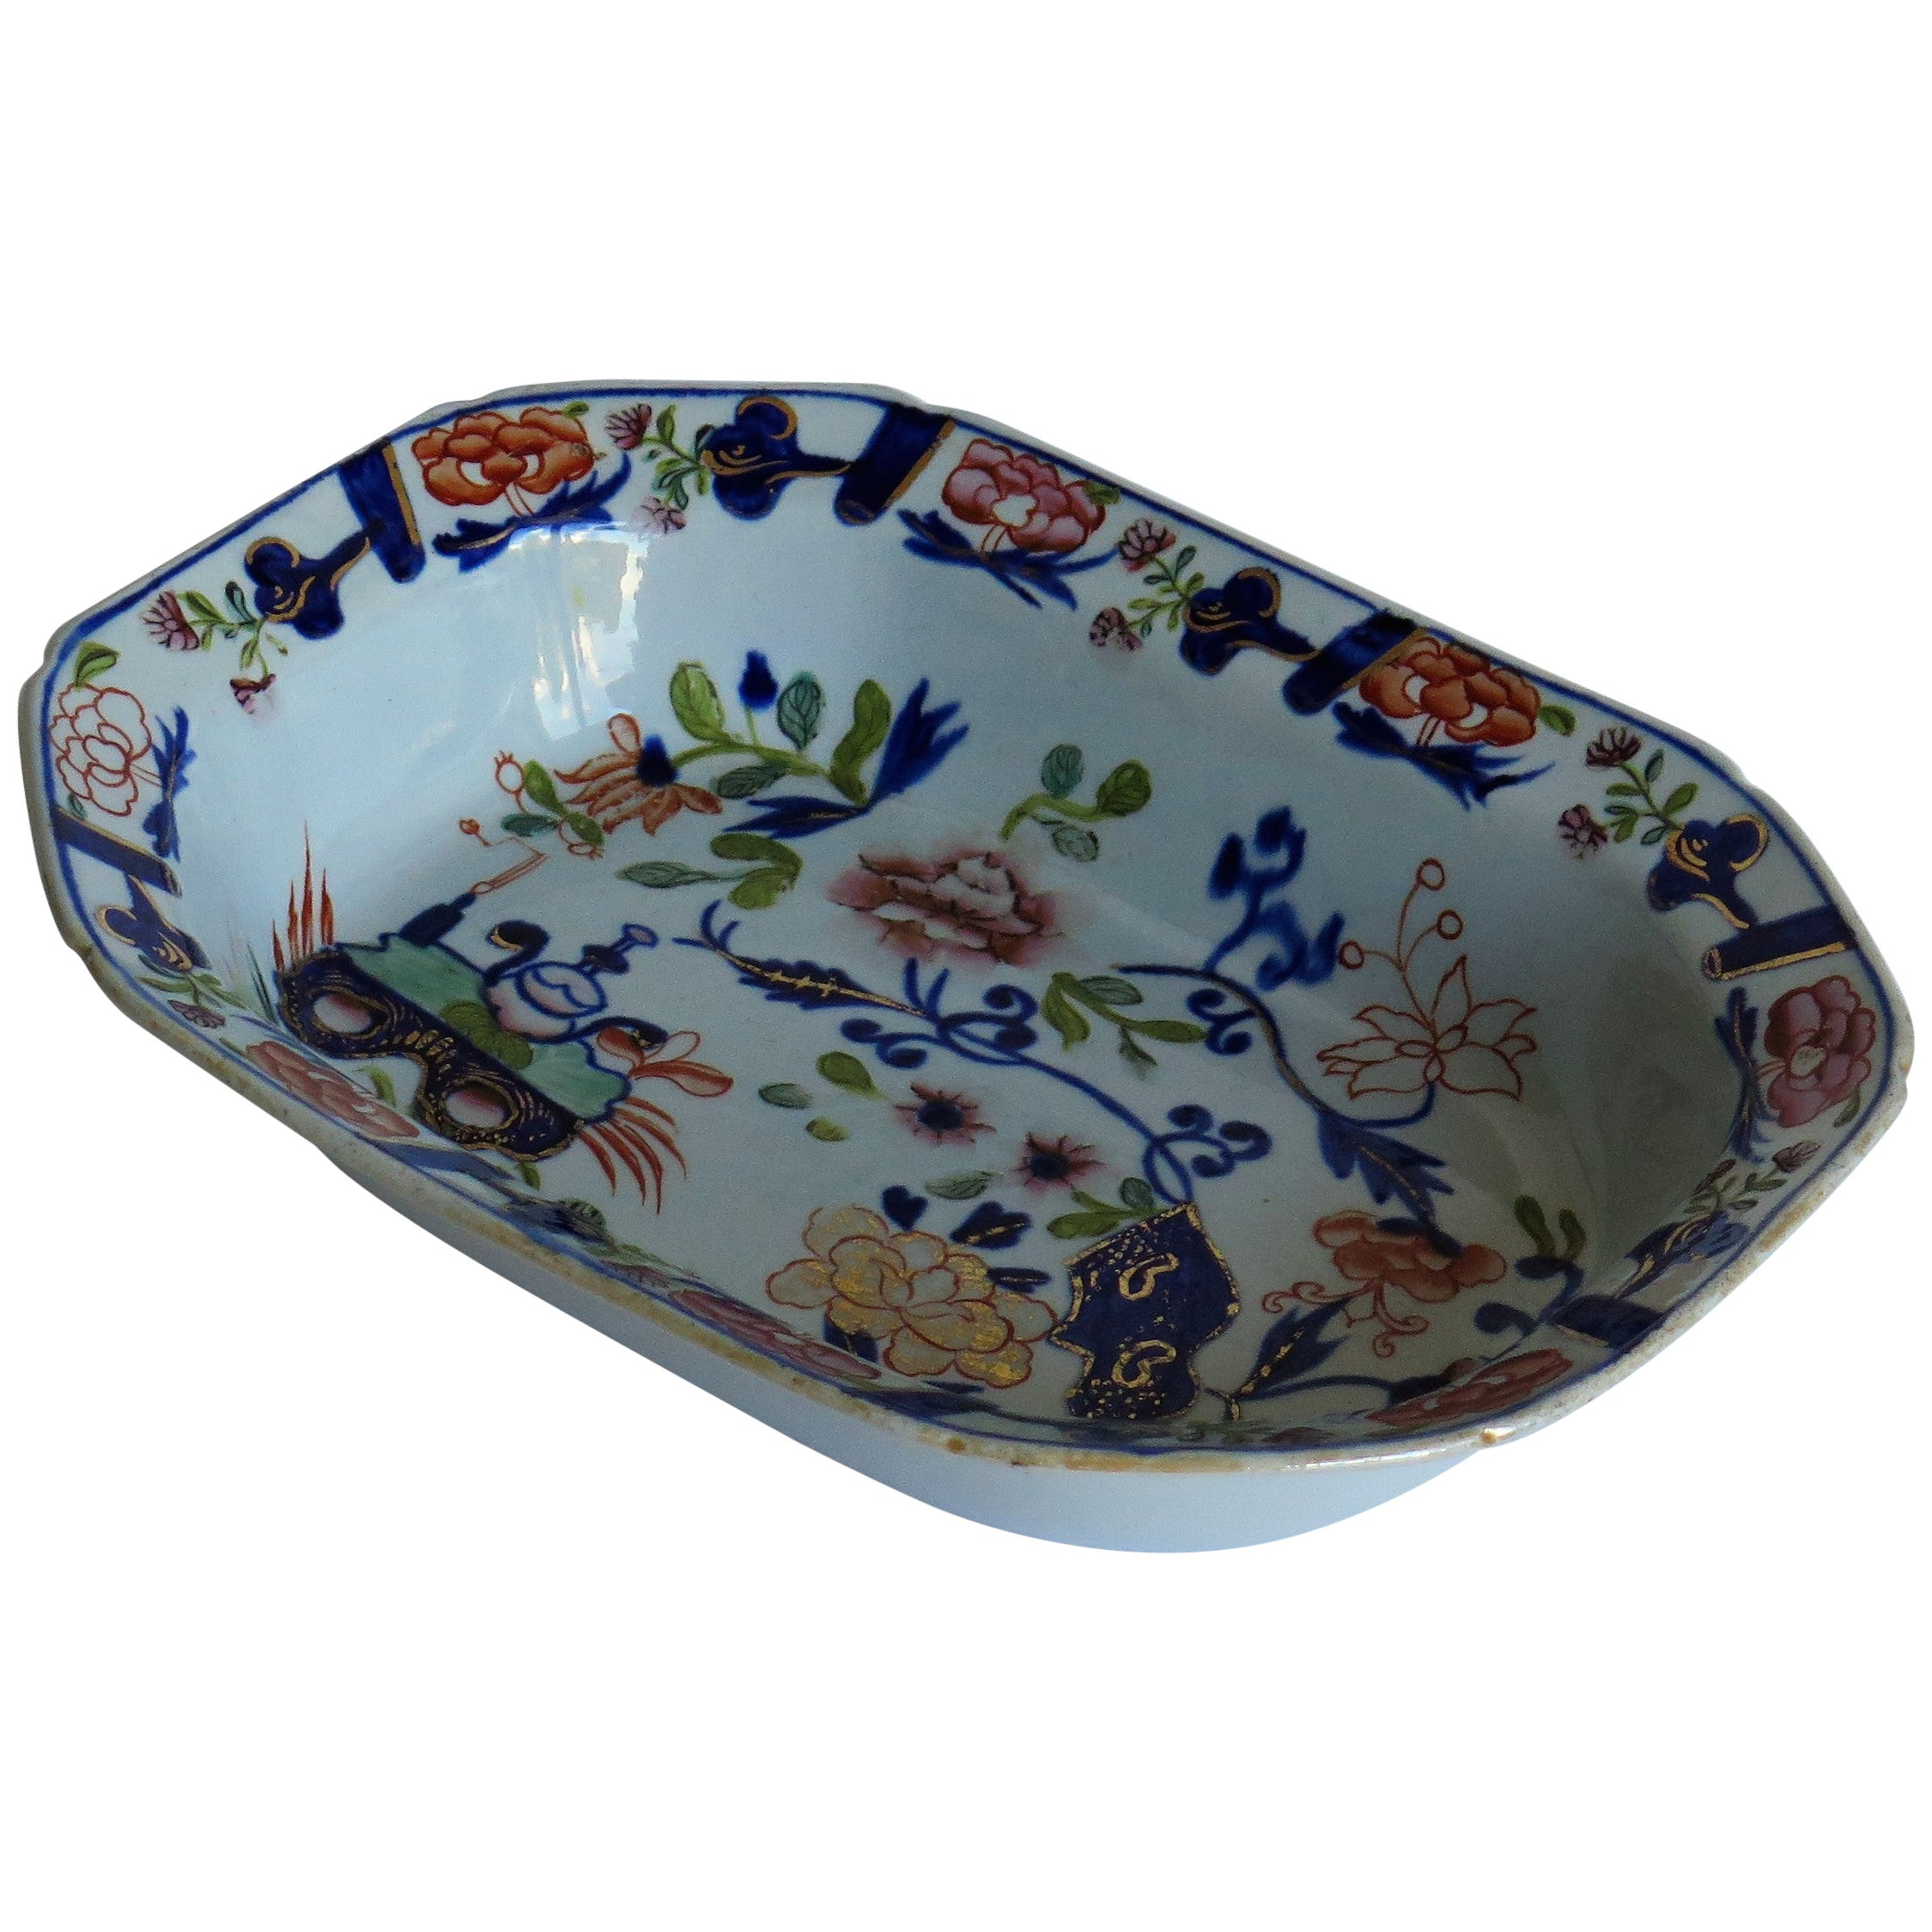 Georgian Mason's Ironstone Pie Dish in Small Vase Flowers & Rock Ptn, circa 1815